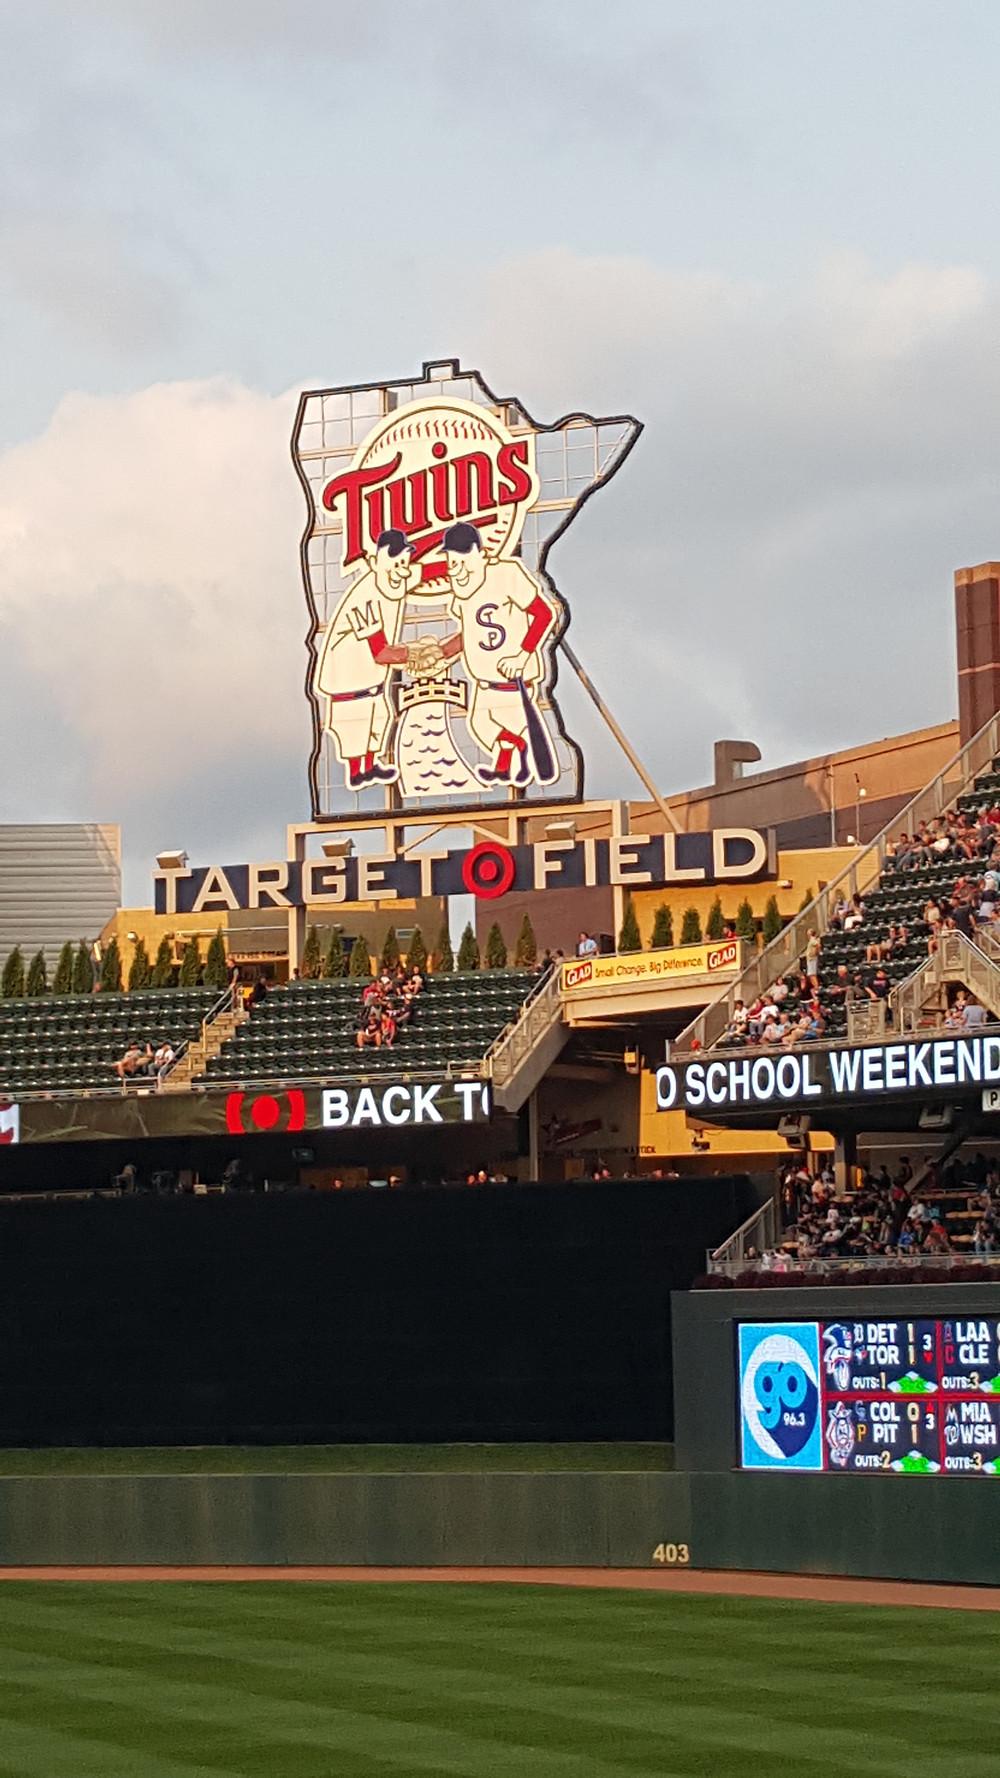 Stadium Review - Target Field - Minneapolis